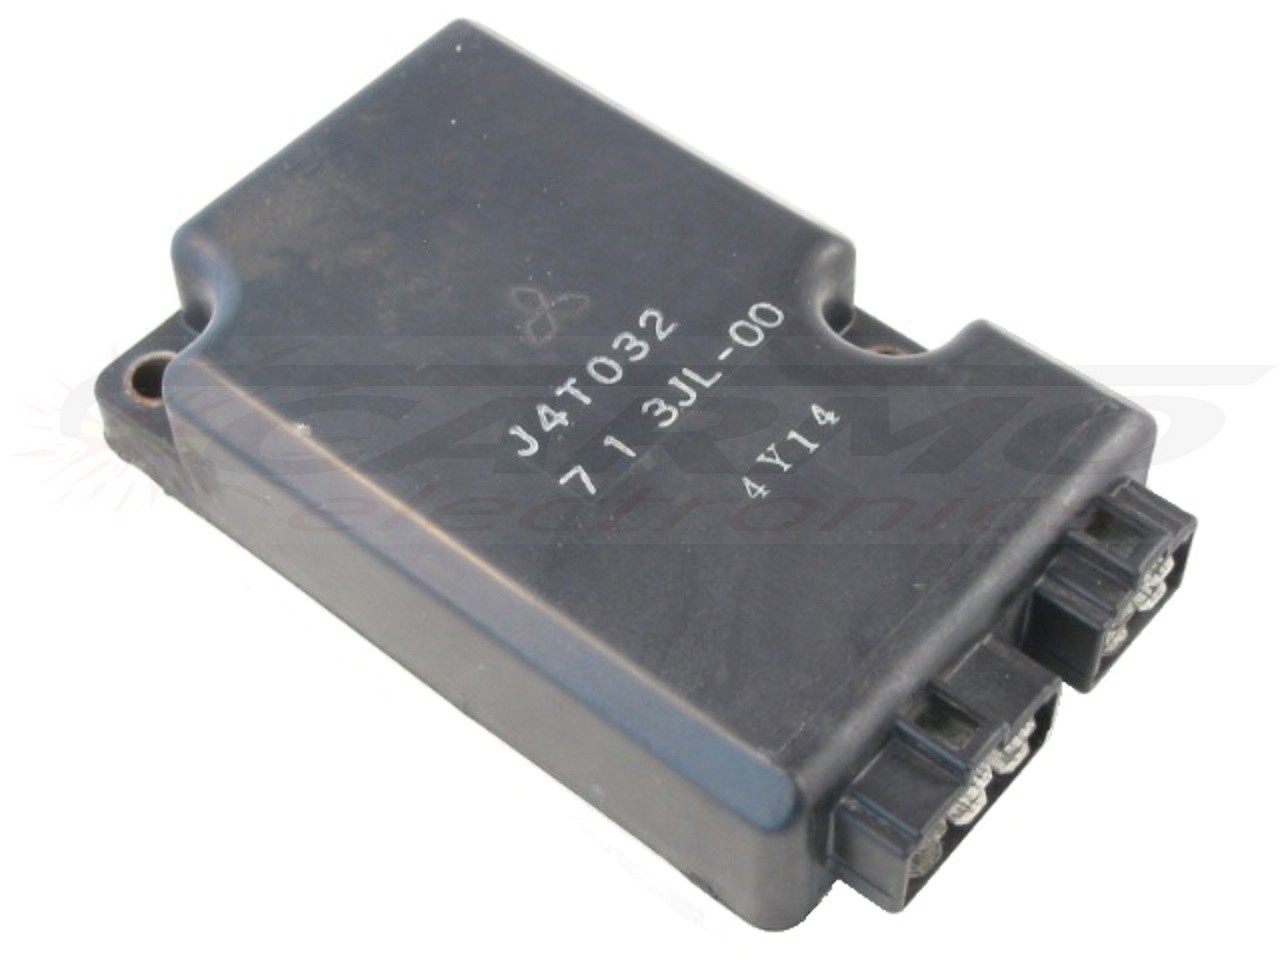 XV 1000 SE - Page 6 Yamaha%20XV750%20(J4T032,%2071%203JL-00)